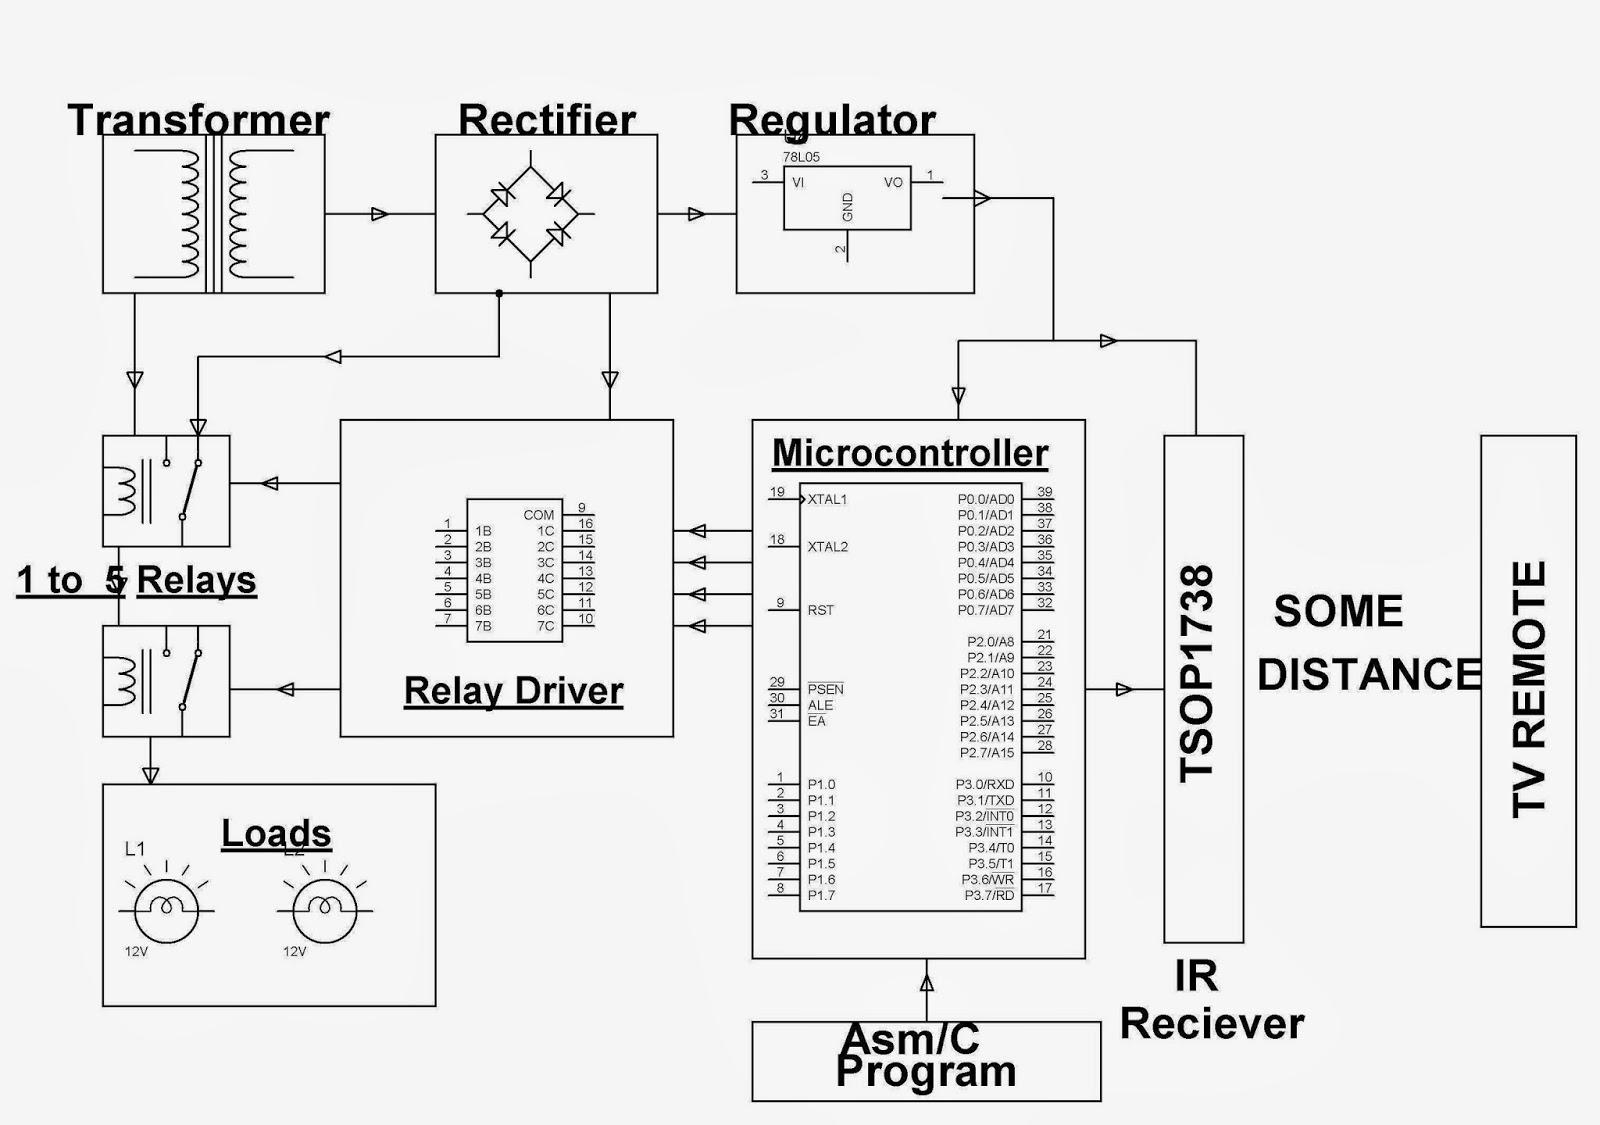 31REMOTE CONTROLLED DOMESTIC APPLIANCES CONTROL | BOLLA TECHNOLOGIES